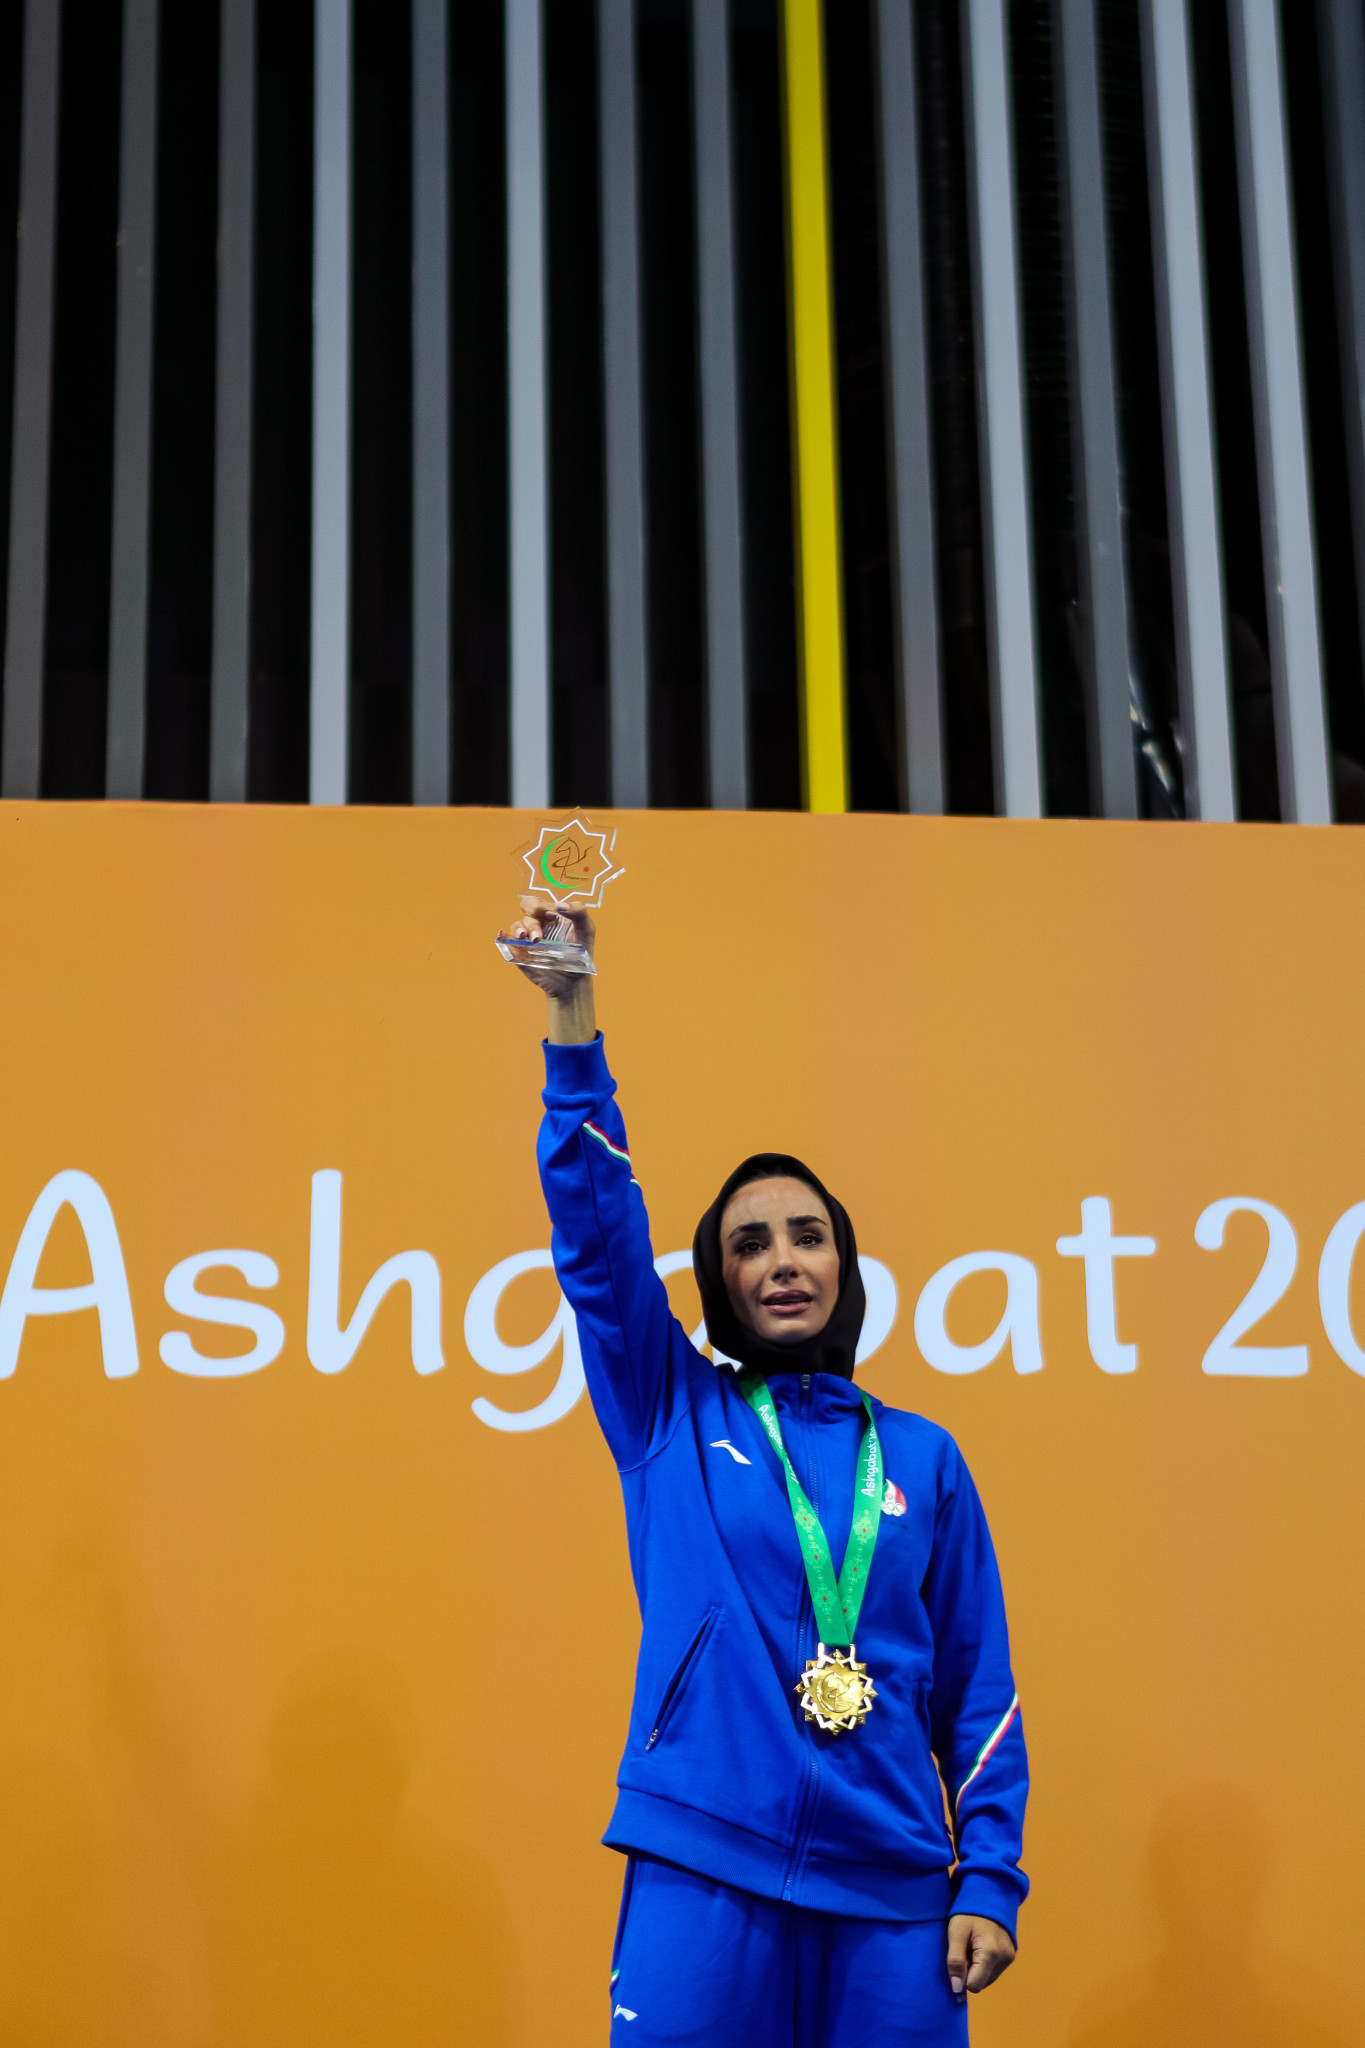 Iranian kickboxer Shahnaz Mirheidari won the women's point fighting under 55kg title ©Ashgabat 2017/Nikos Karanikolas/Laurel Photo Services